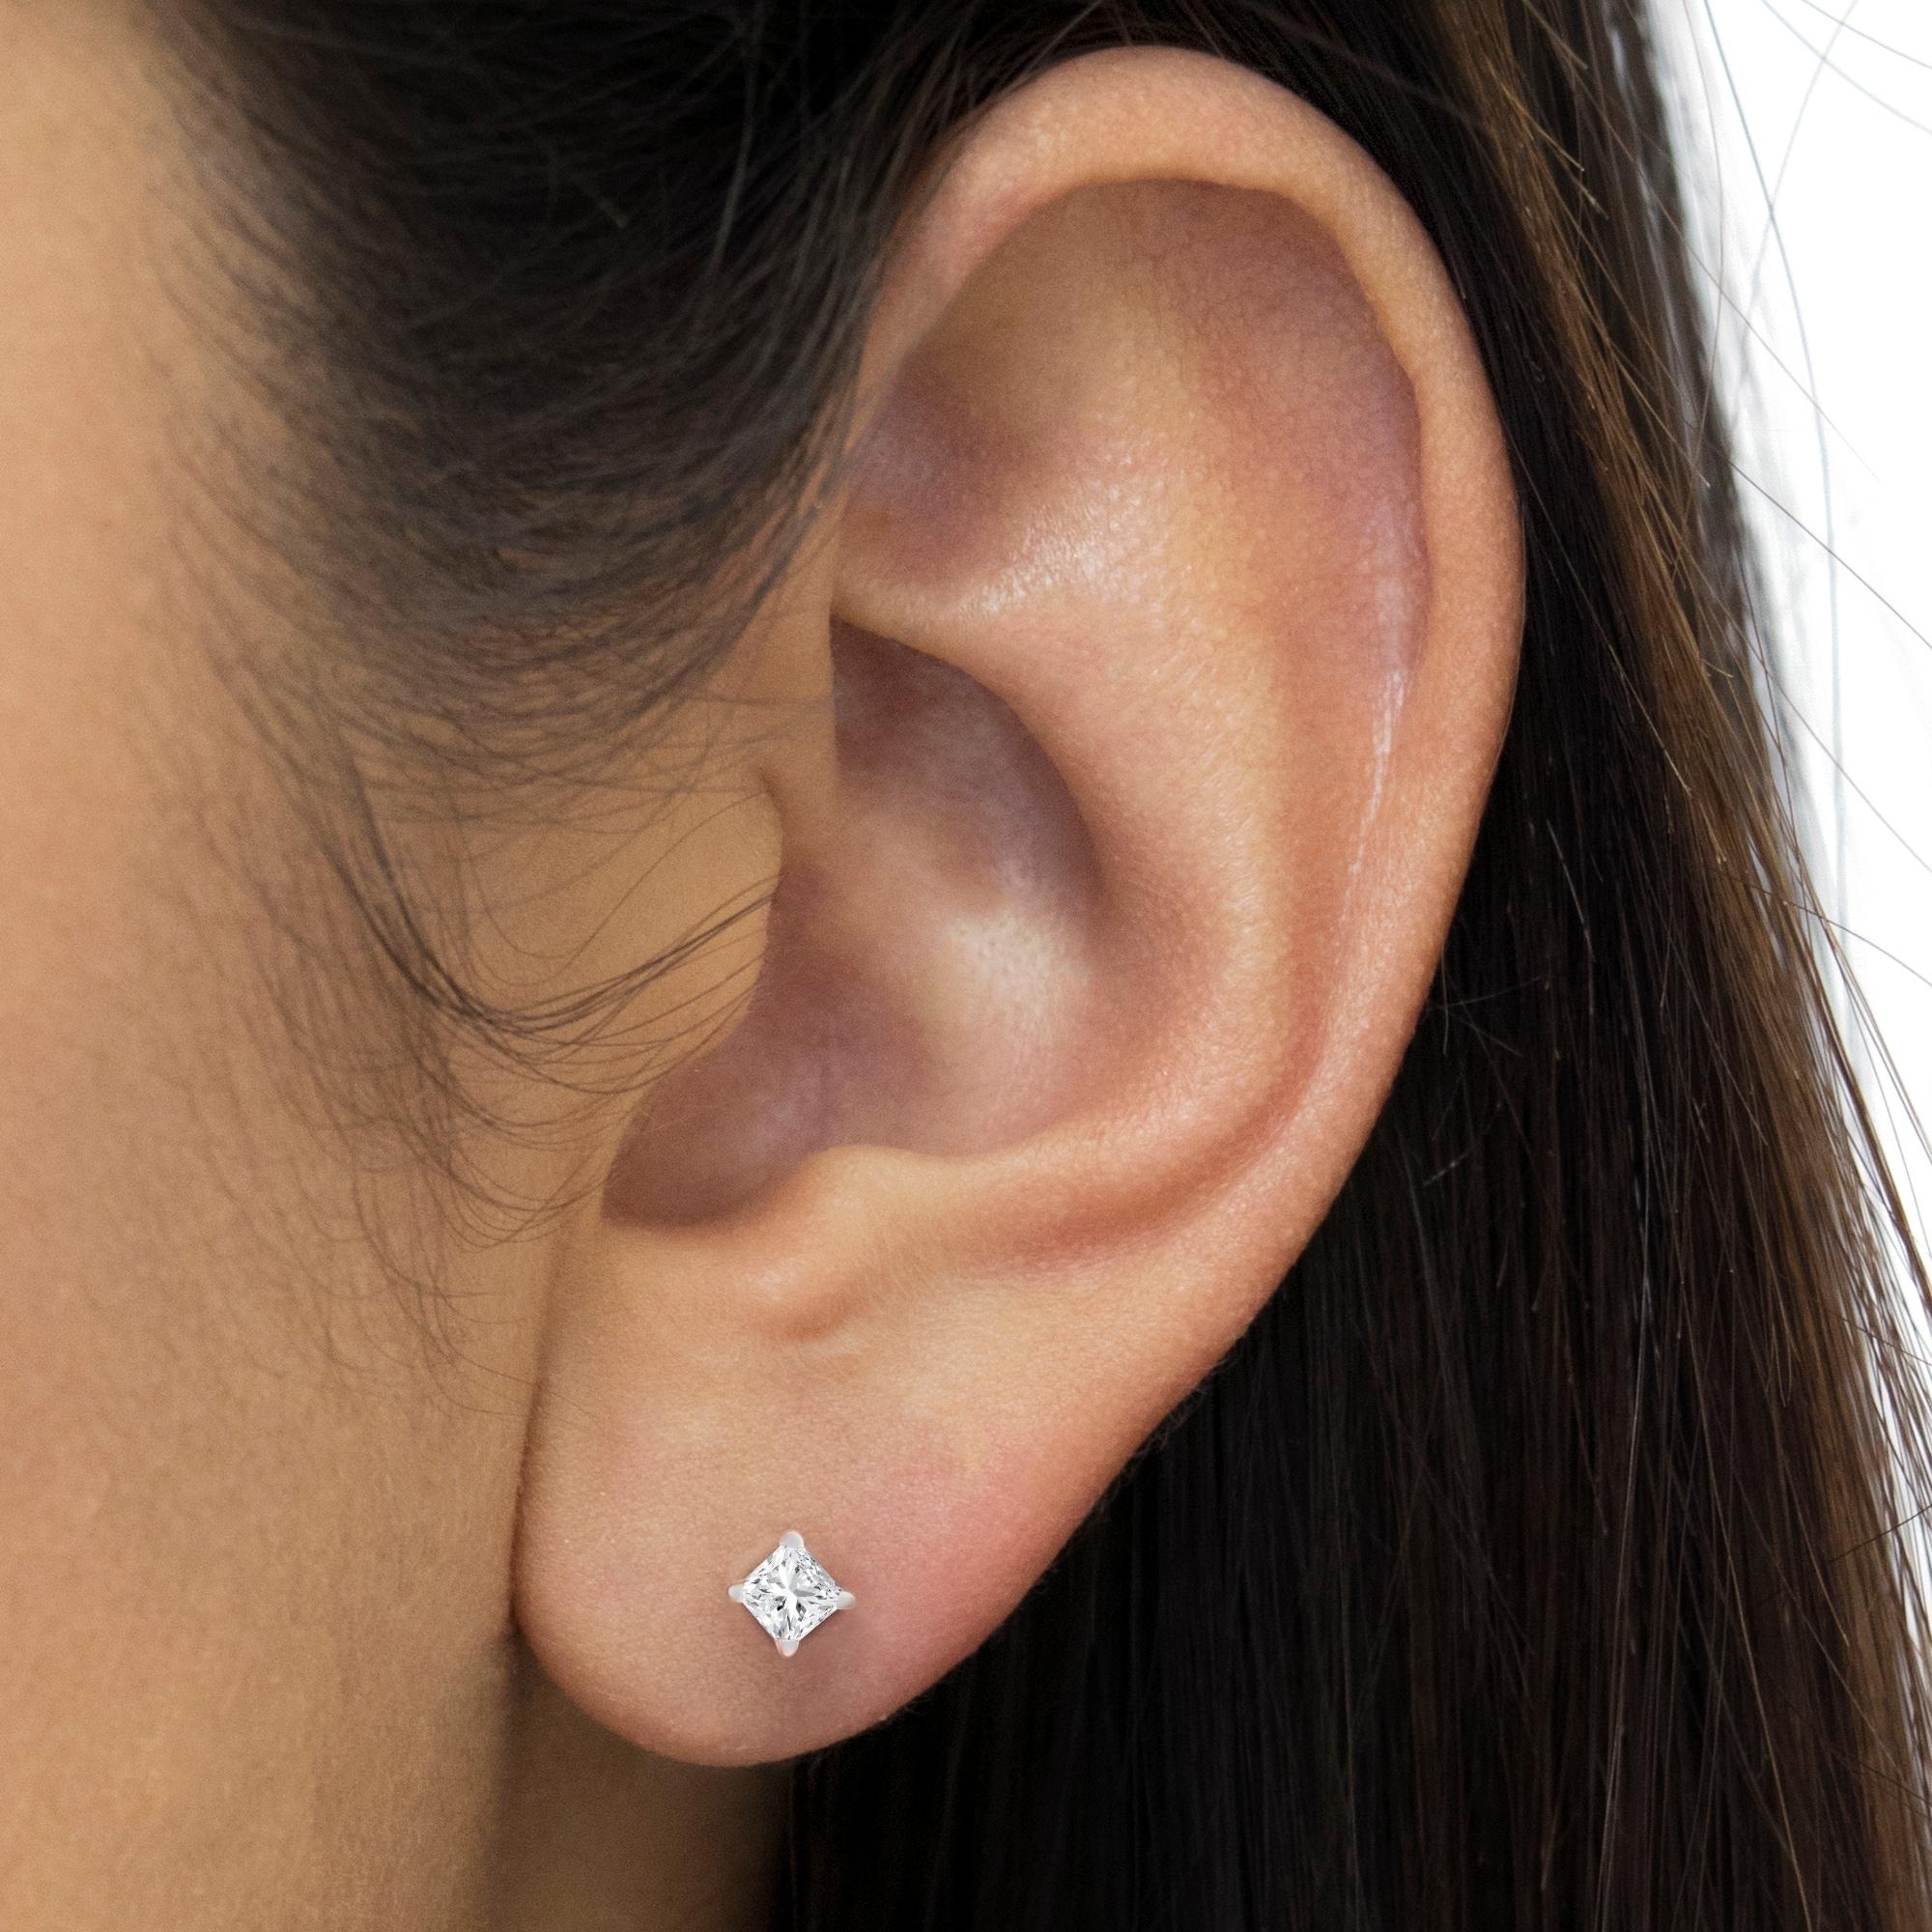 Shop 14K White Gold 1 ct Princess Cut Diamond Solitaire Stud Earrings (G-H bdfef5d29066